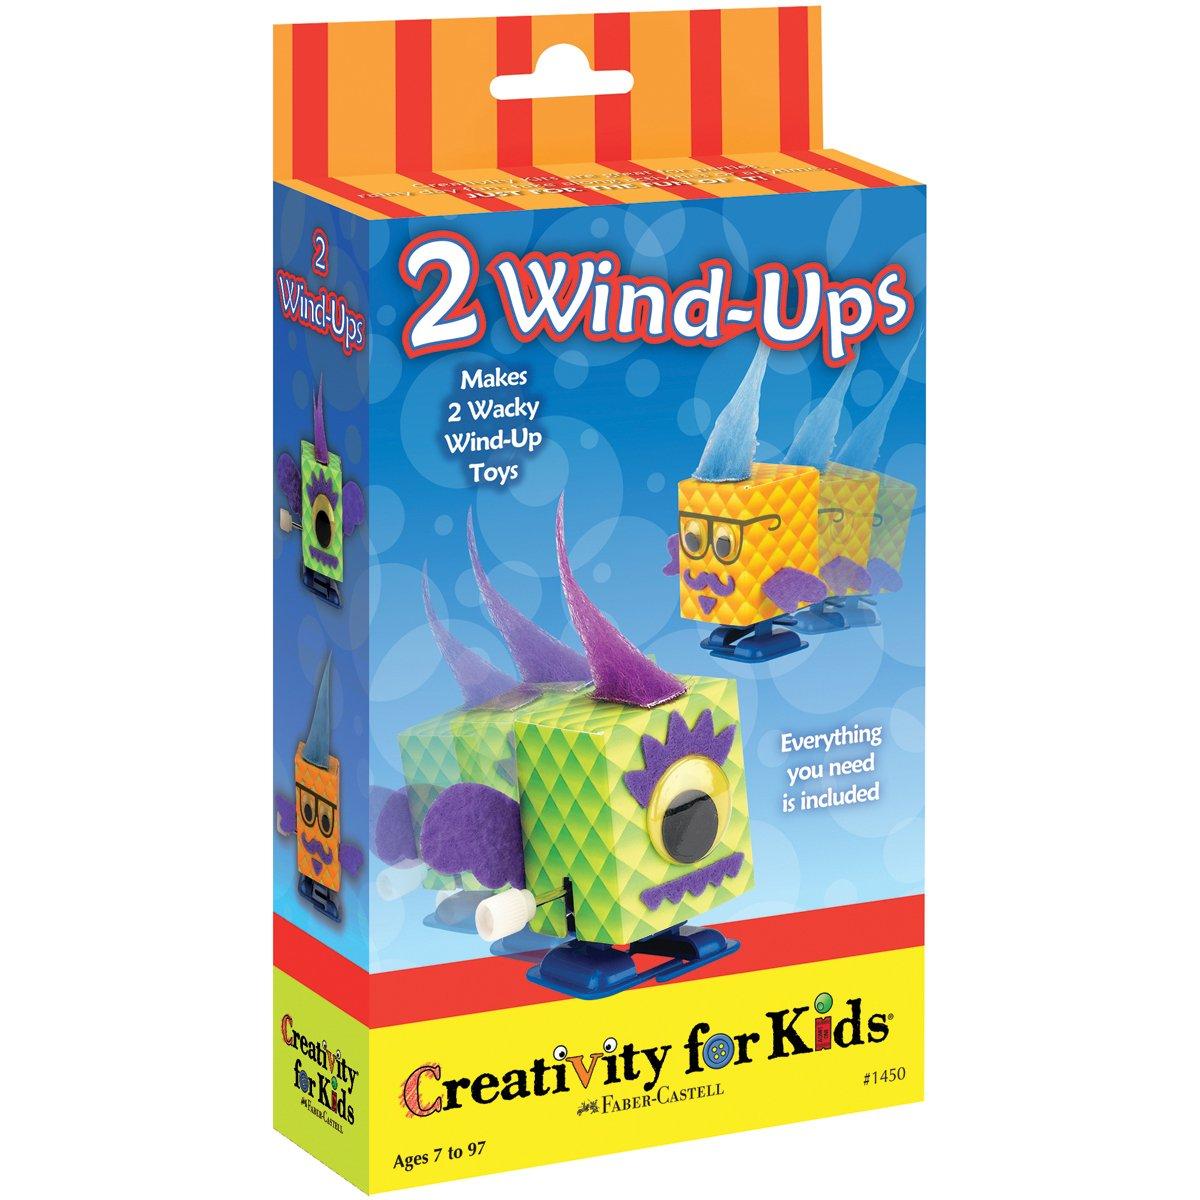 Creativity for Kids CFK1450 - Mini-Bastelset: 2 Aufziehfiguren, Kinder-Bastelset CK-1450